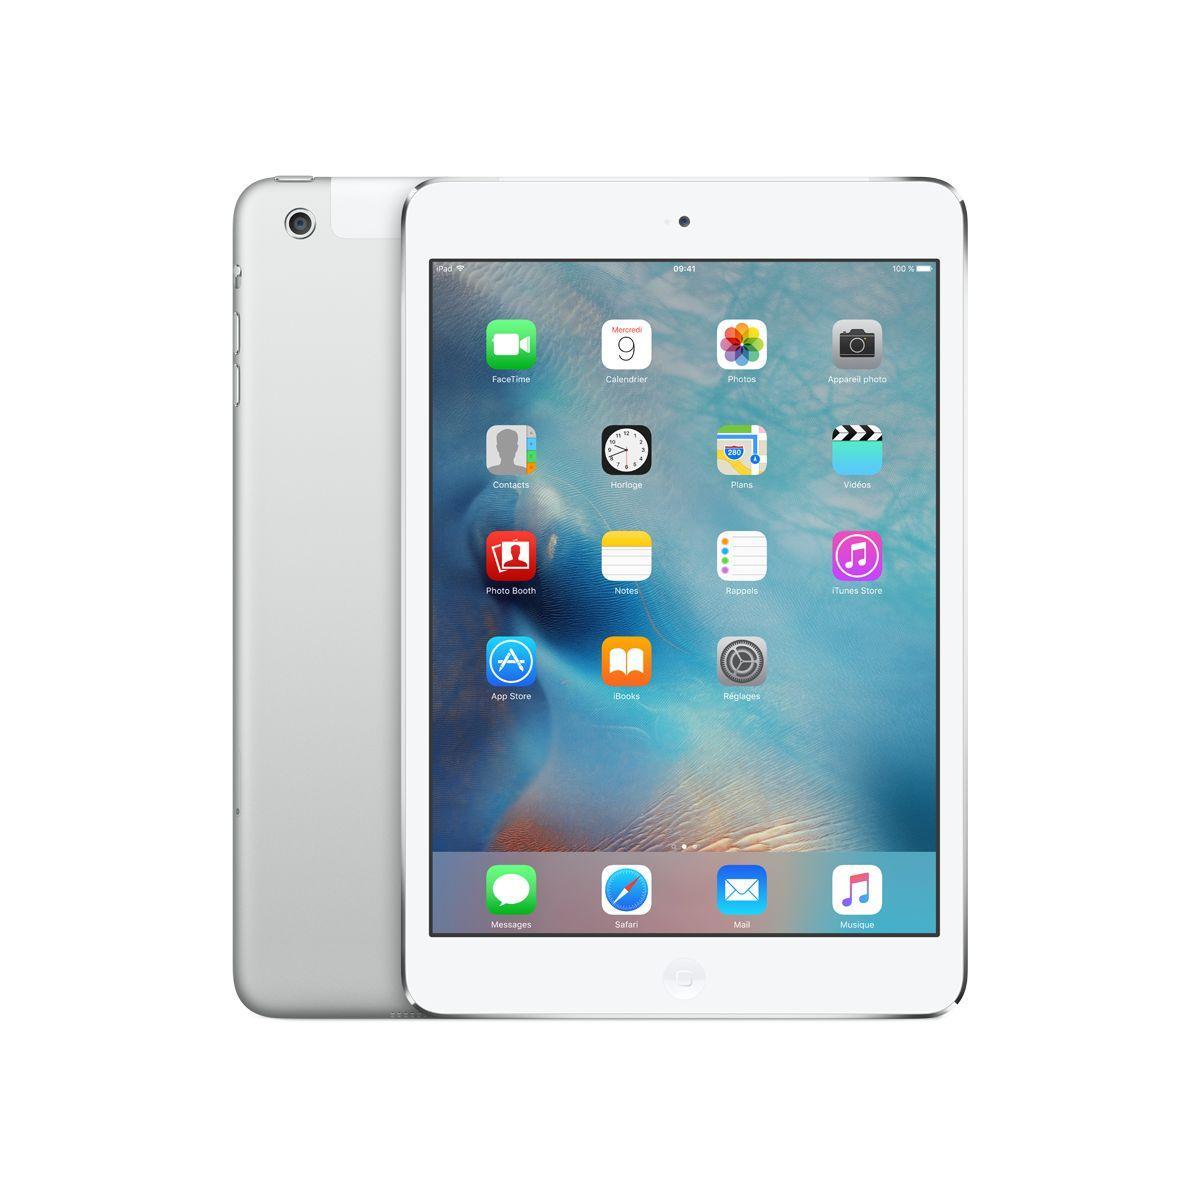 Apple ipad mini 2 32go cellular argent - livraison offerte : code chronoff (photo)